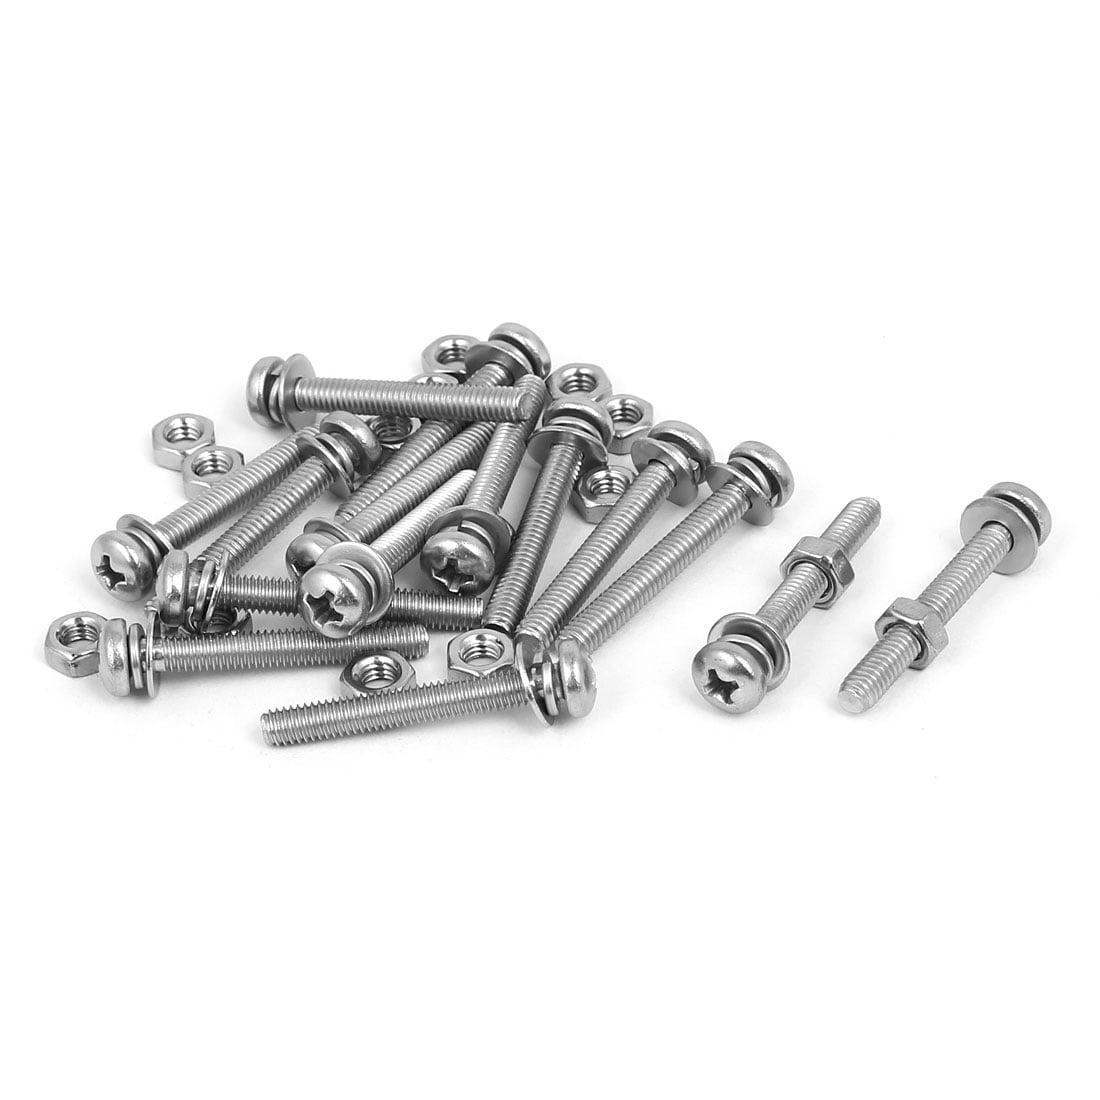 8 x 2-1//2 Piece-100 Hard-to-Find Fastener 014973208127 White Phillips Pan Sheet Metal Screws